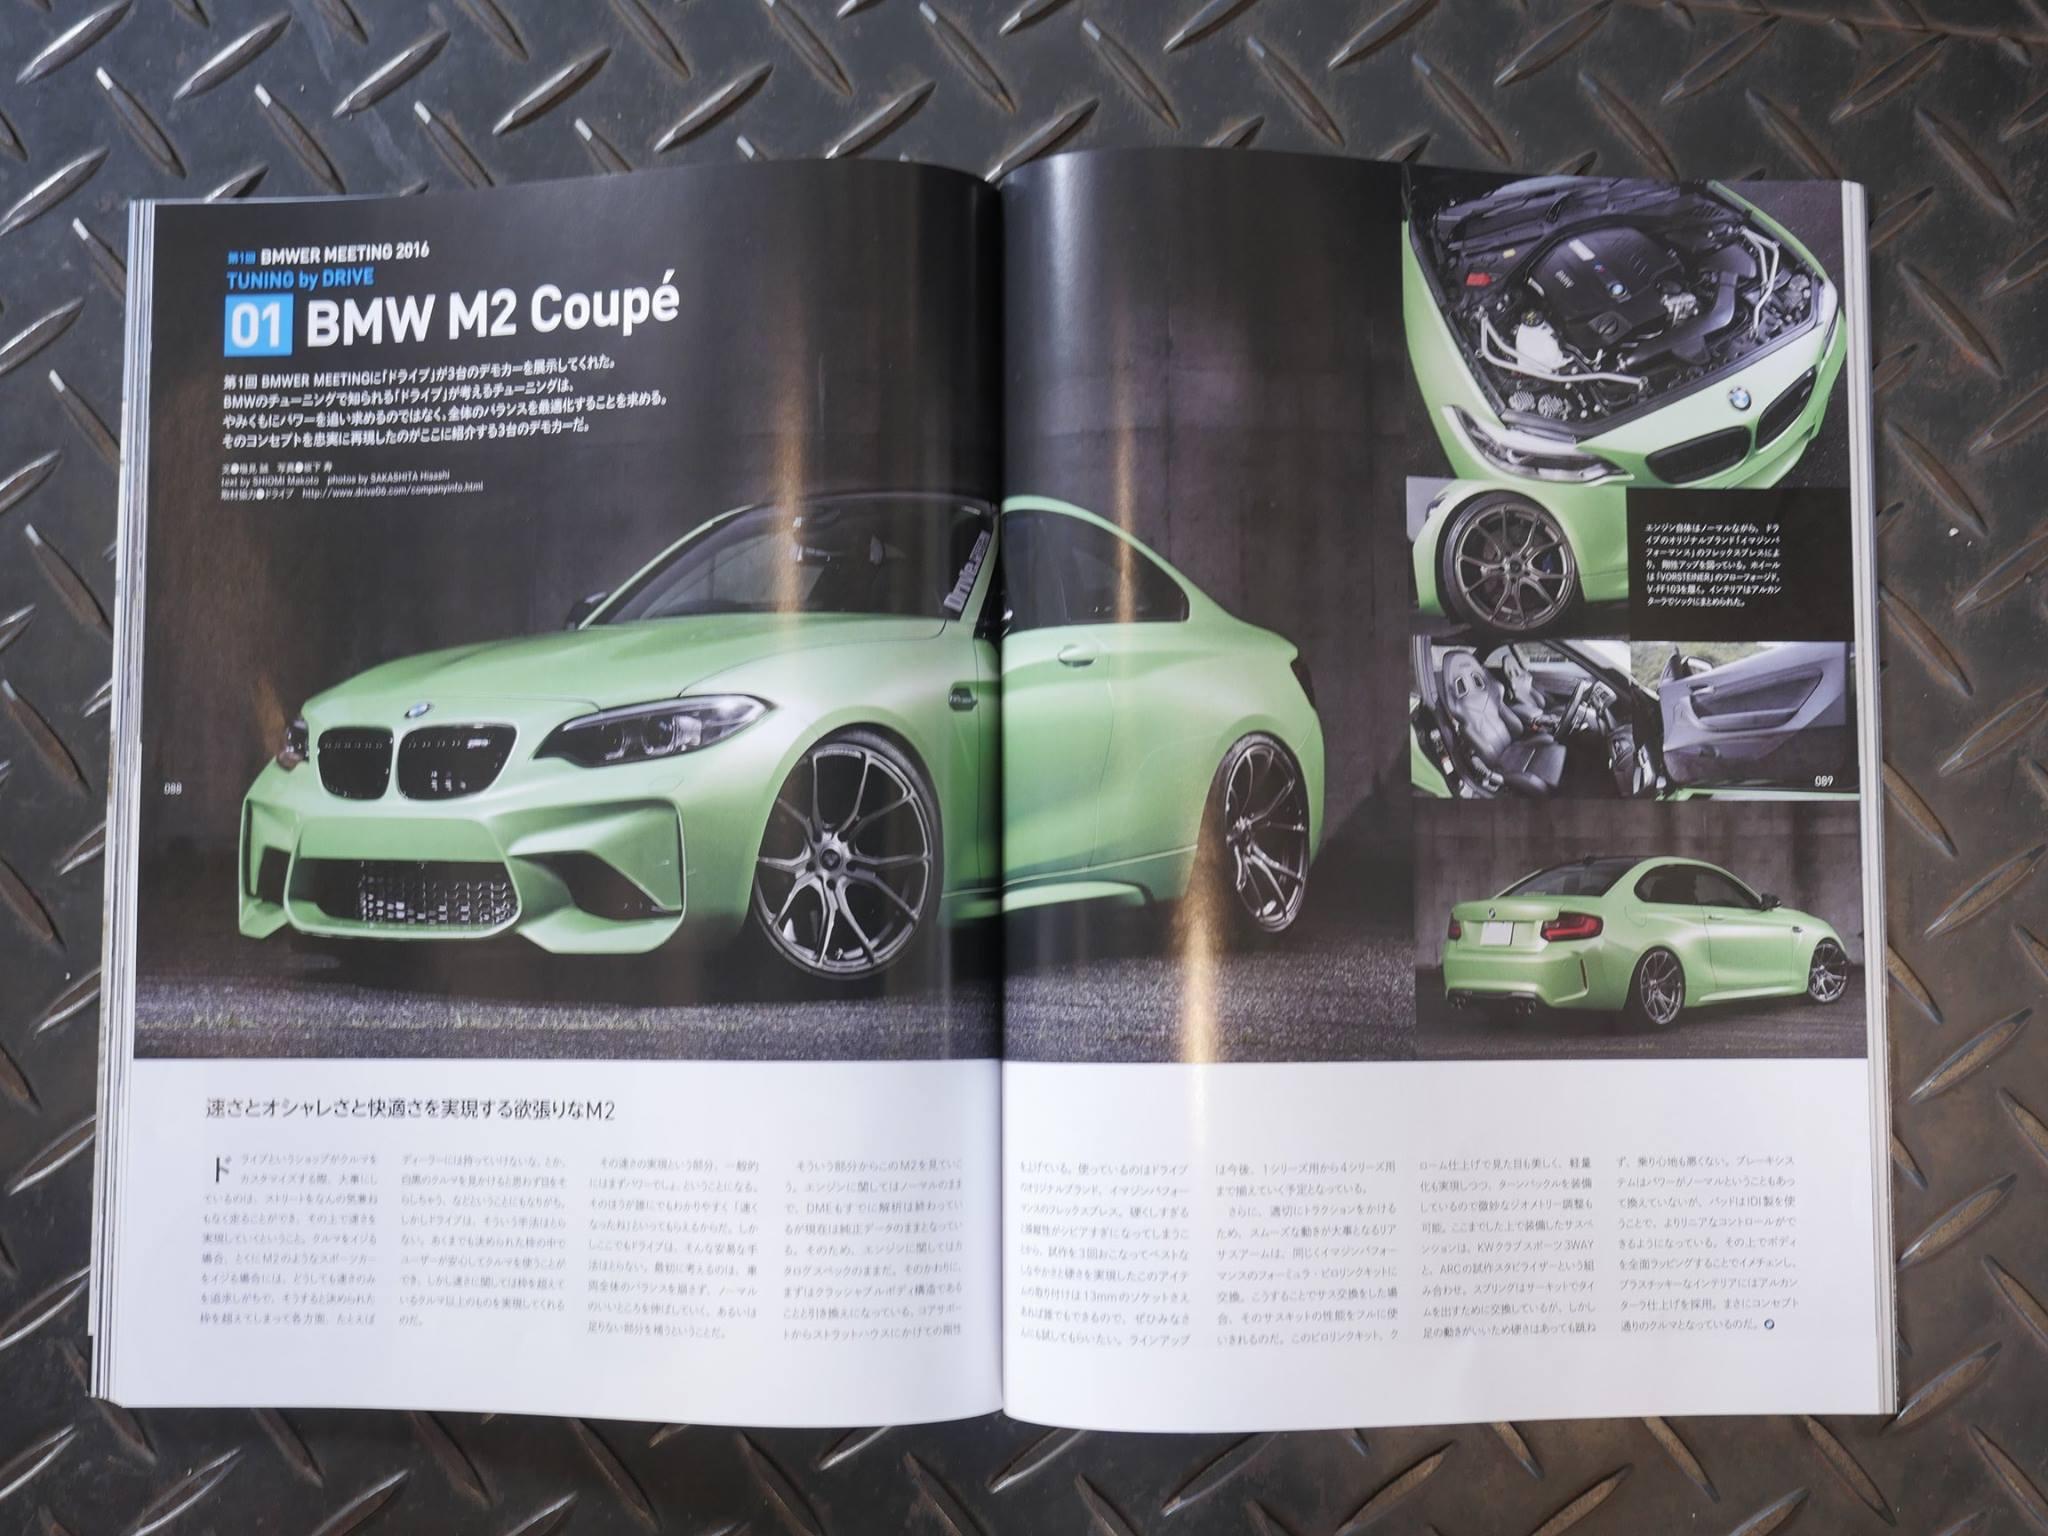 BMWを中心にしたEURO専門のPARTS SHOP、Drive.